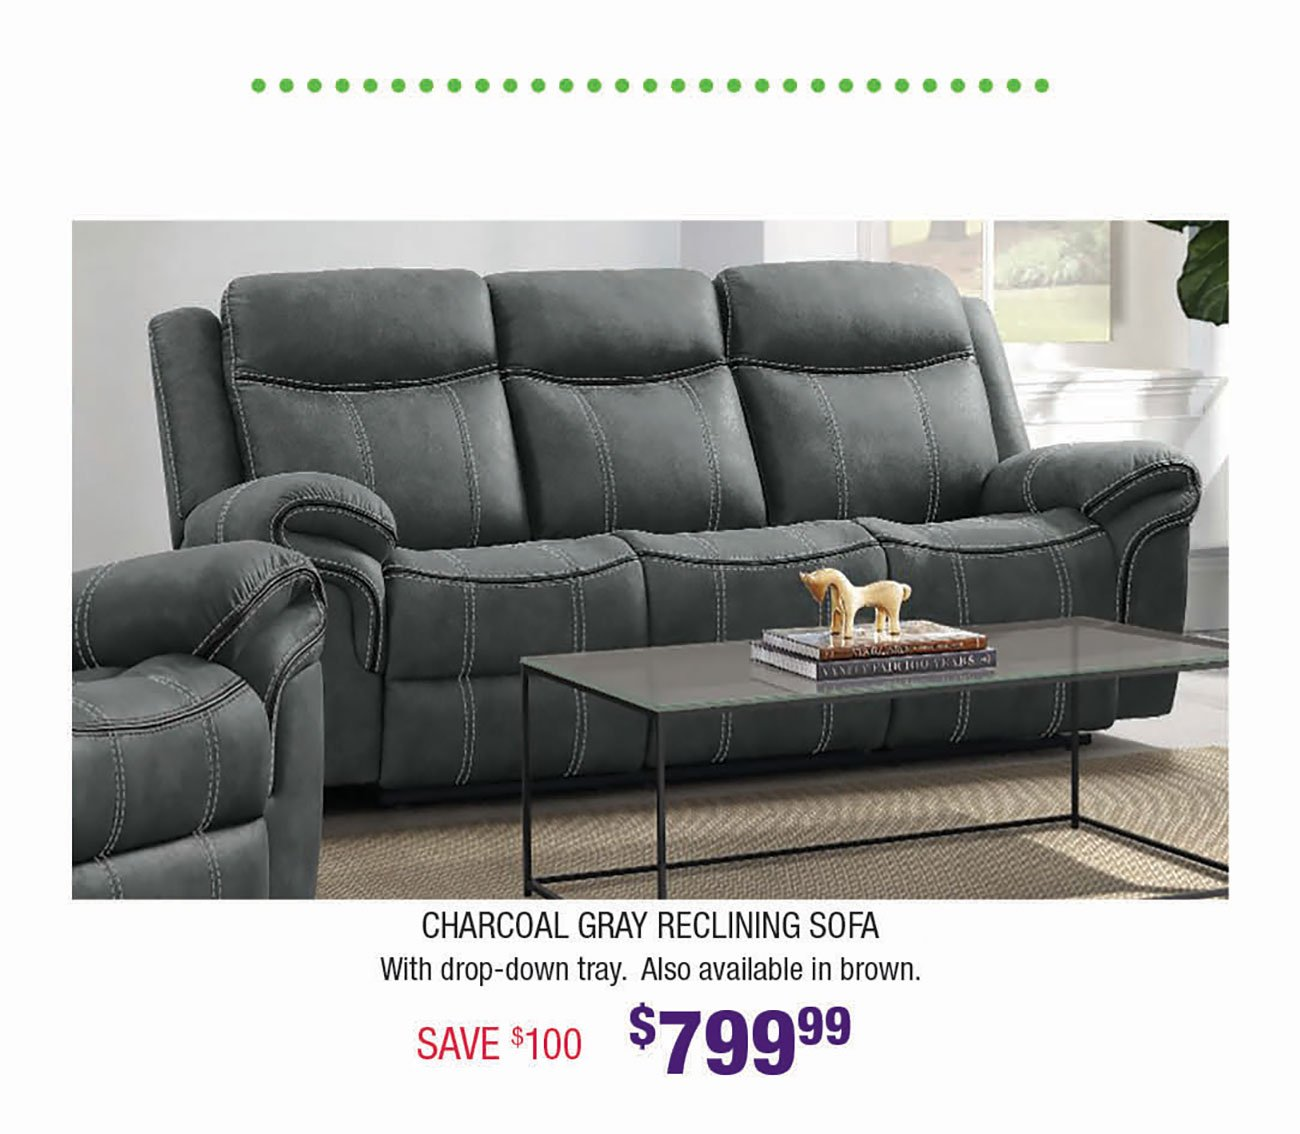 Charcoal-Gray-Reclining-Sofa